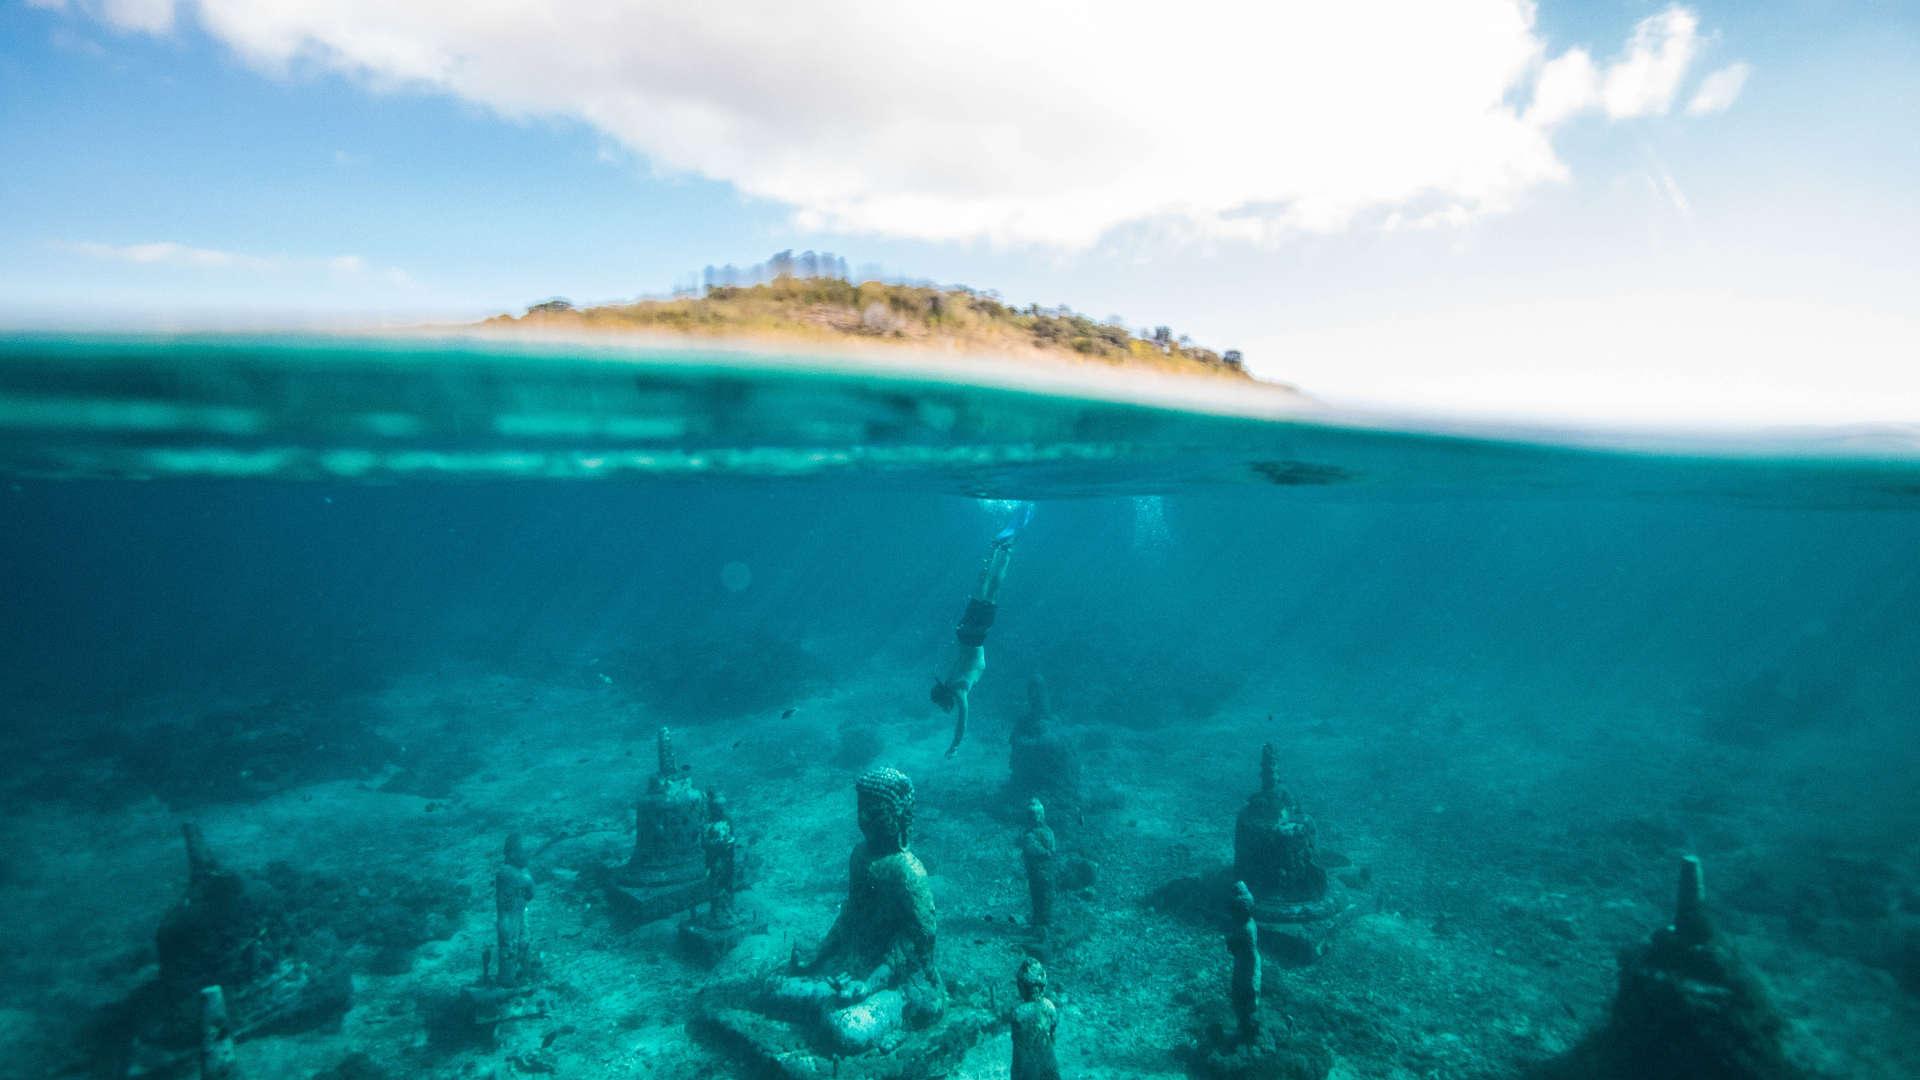 indonesia bali diving buddhism submerged buddhas